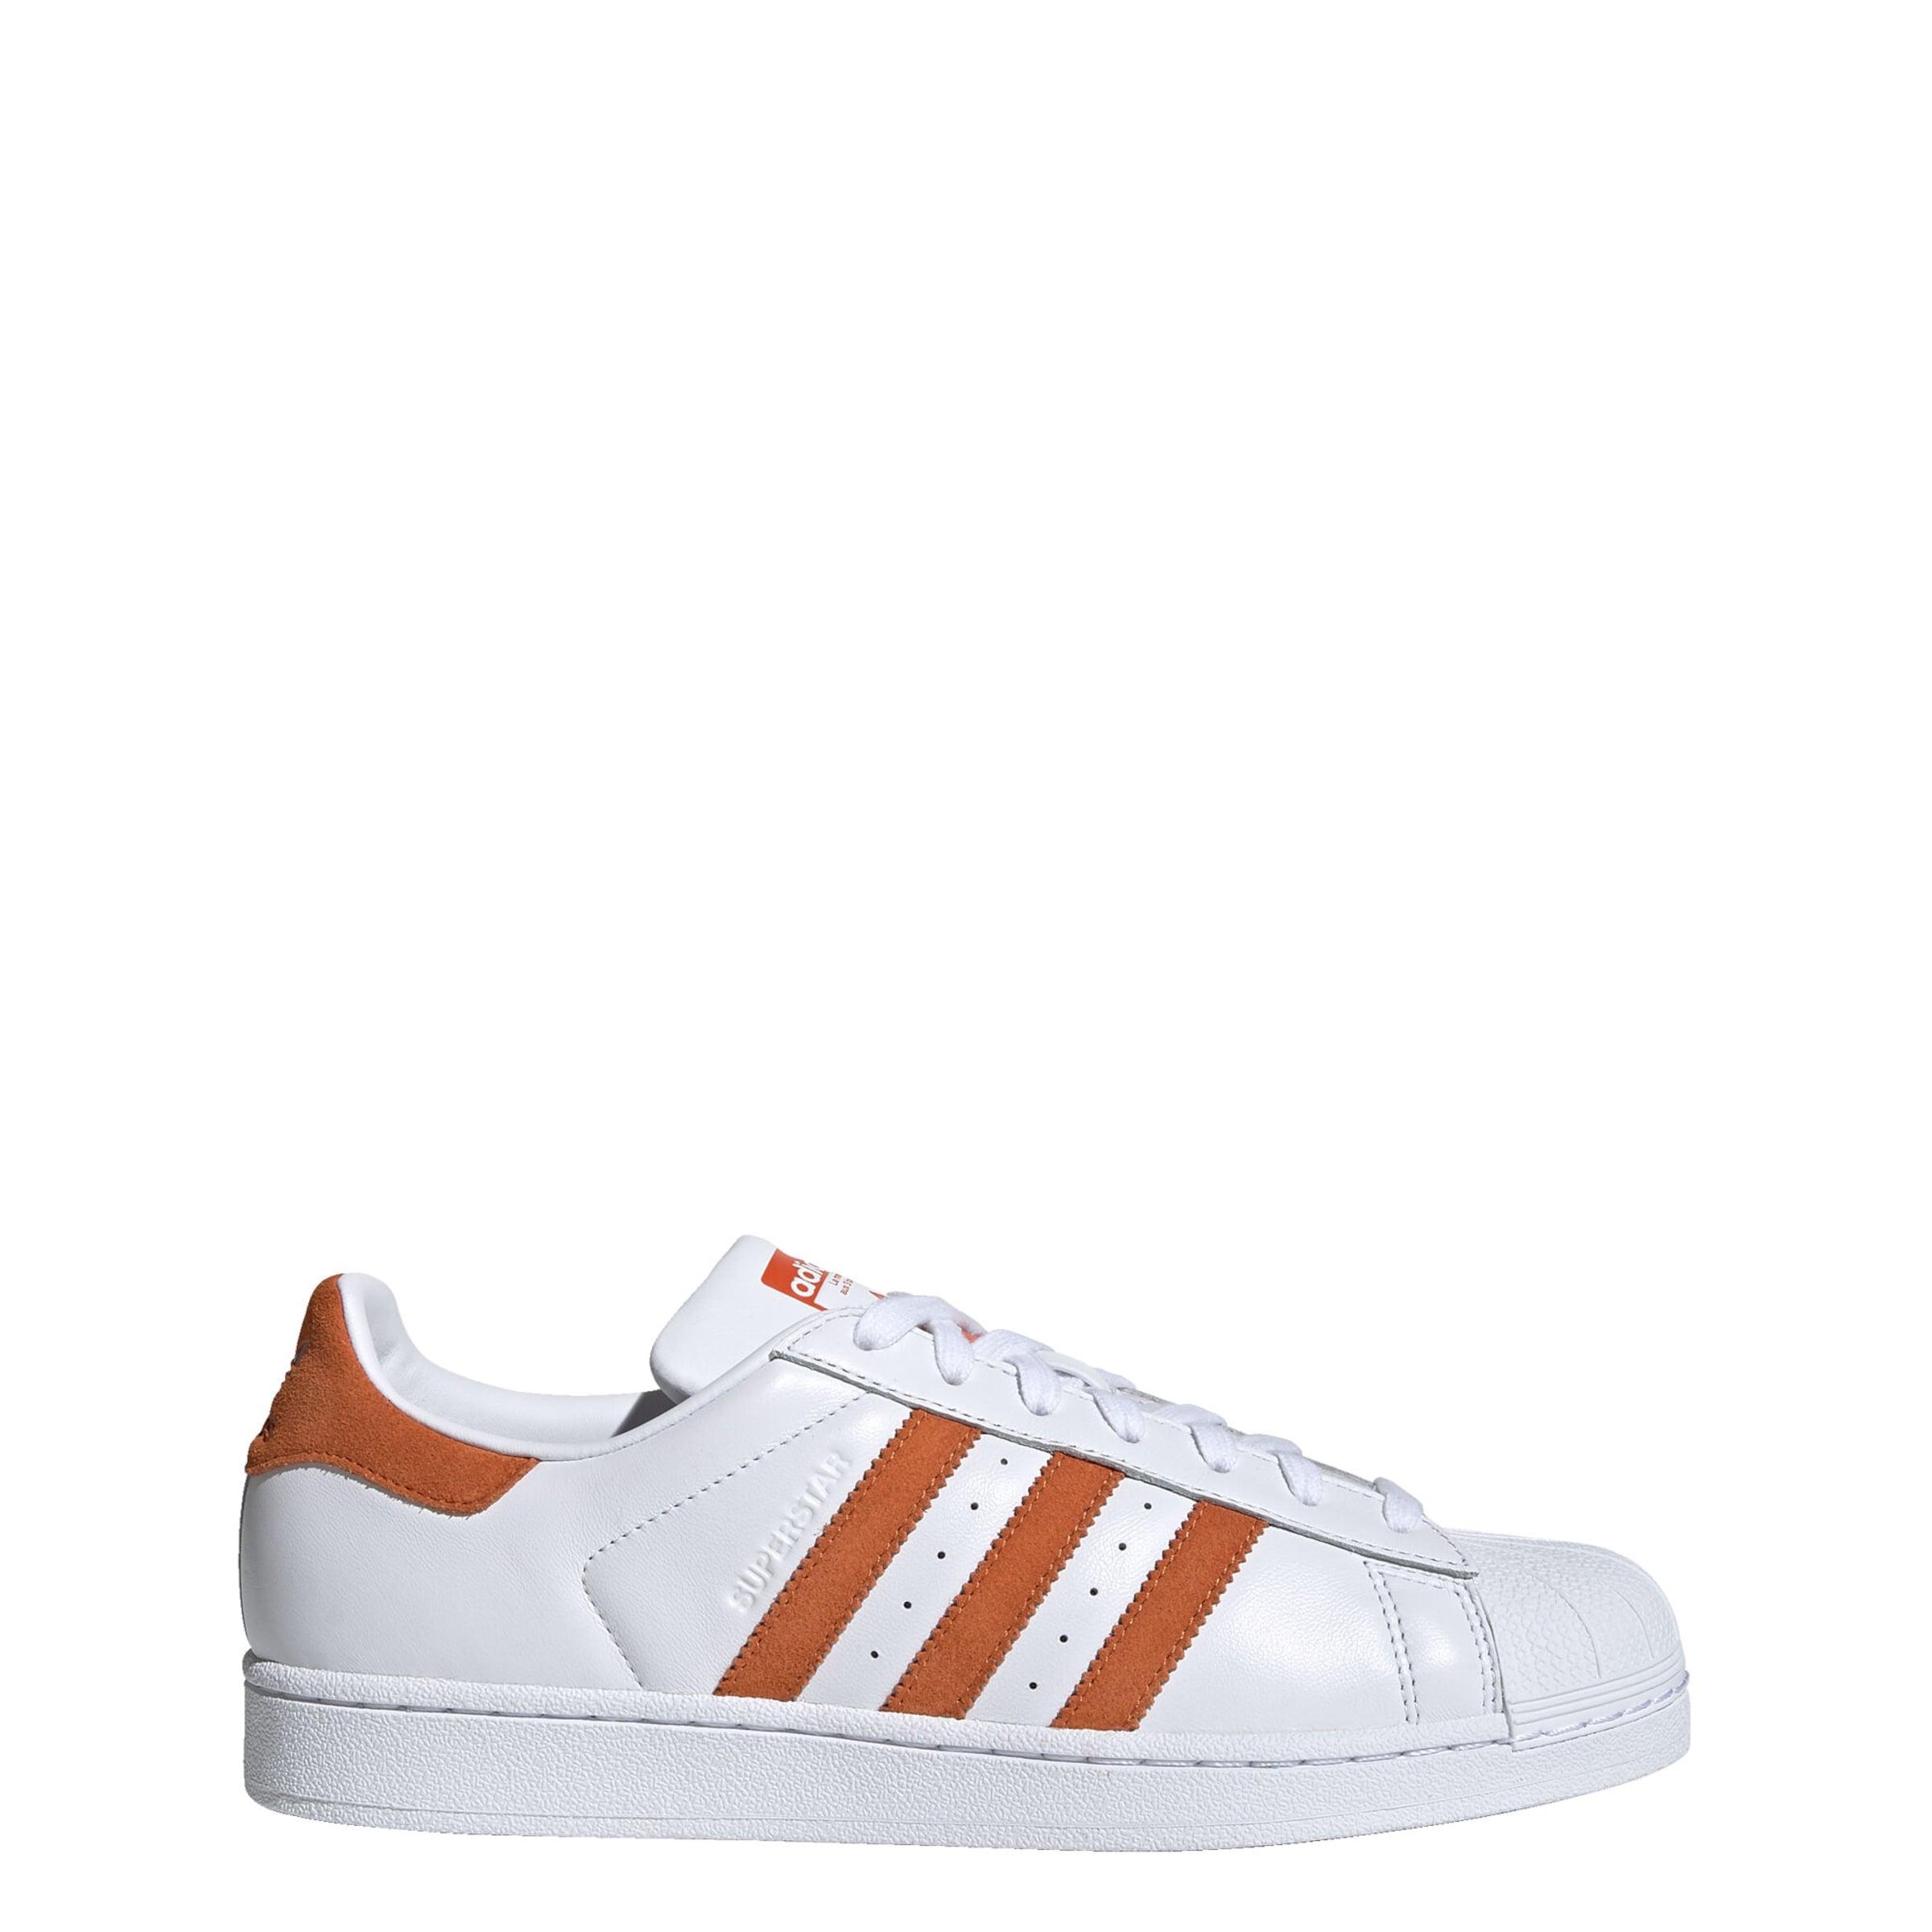 In Shoes 'superstar' BronzeWeiß Adidas Originals W9IH2DE